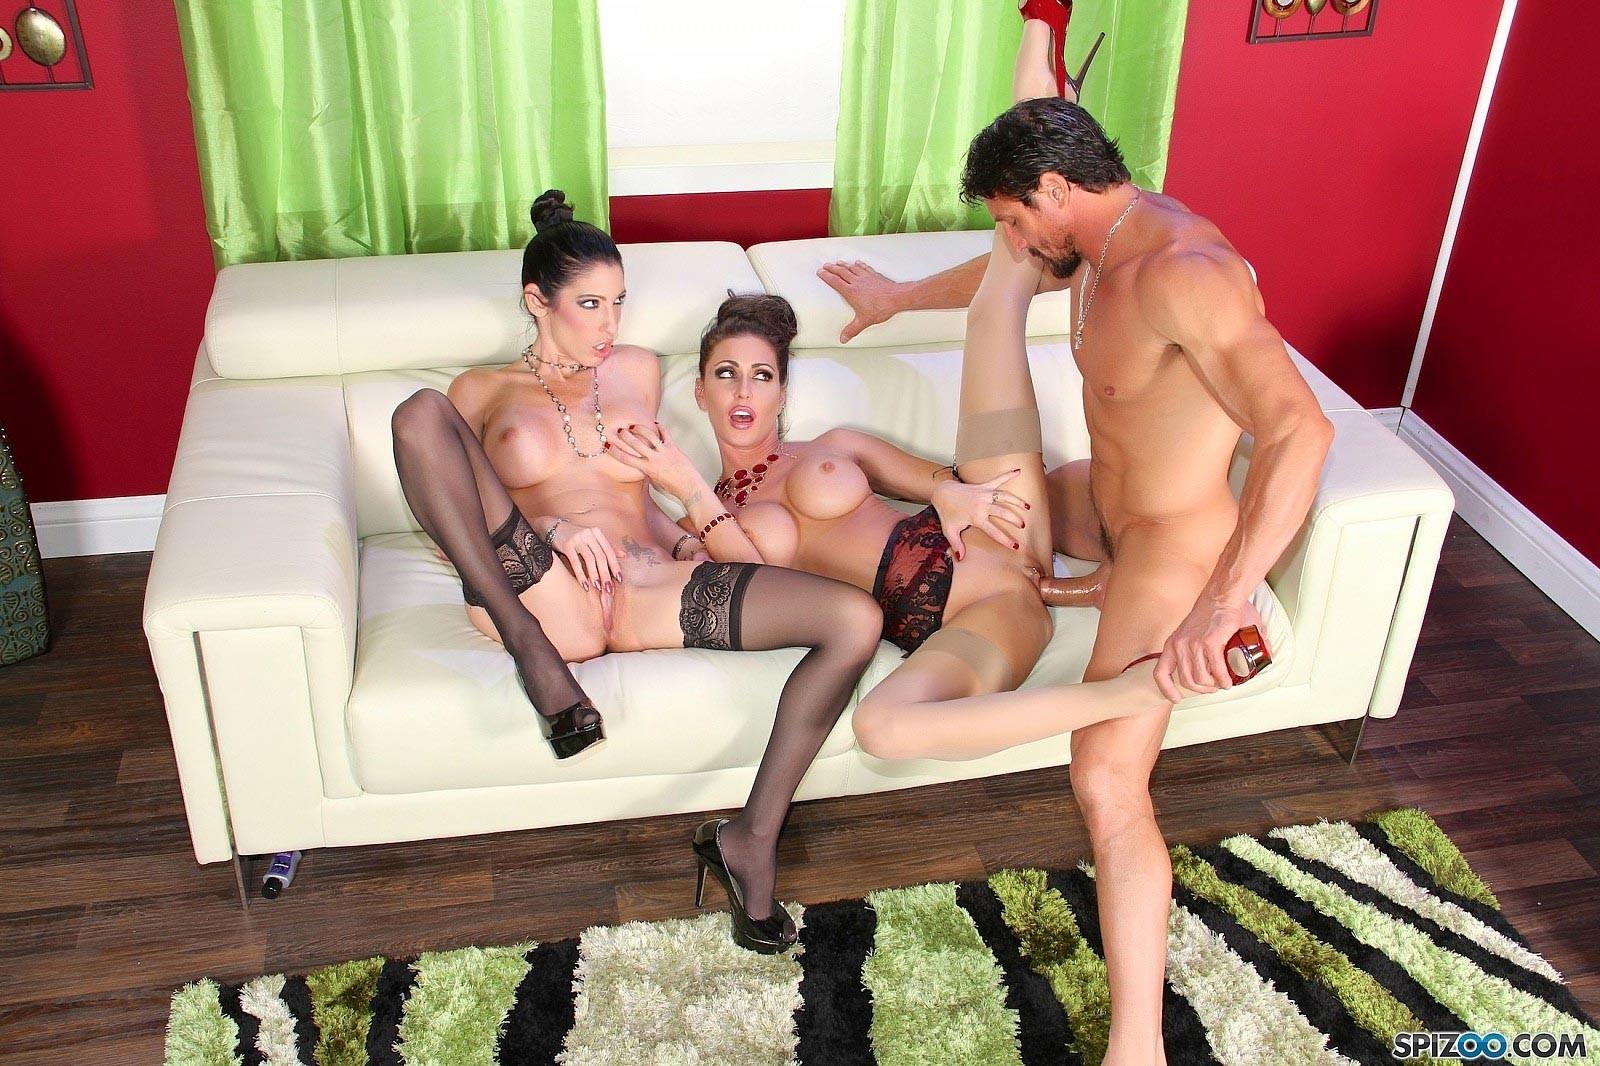 Jessica Jaymes, Dava Foxx - Галерея 3465490